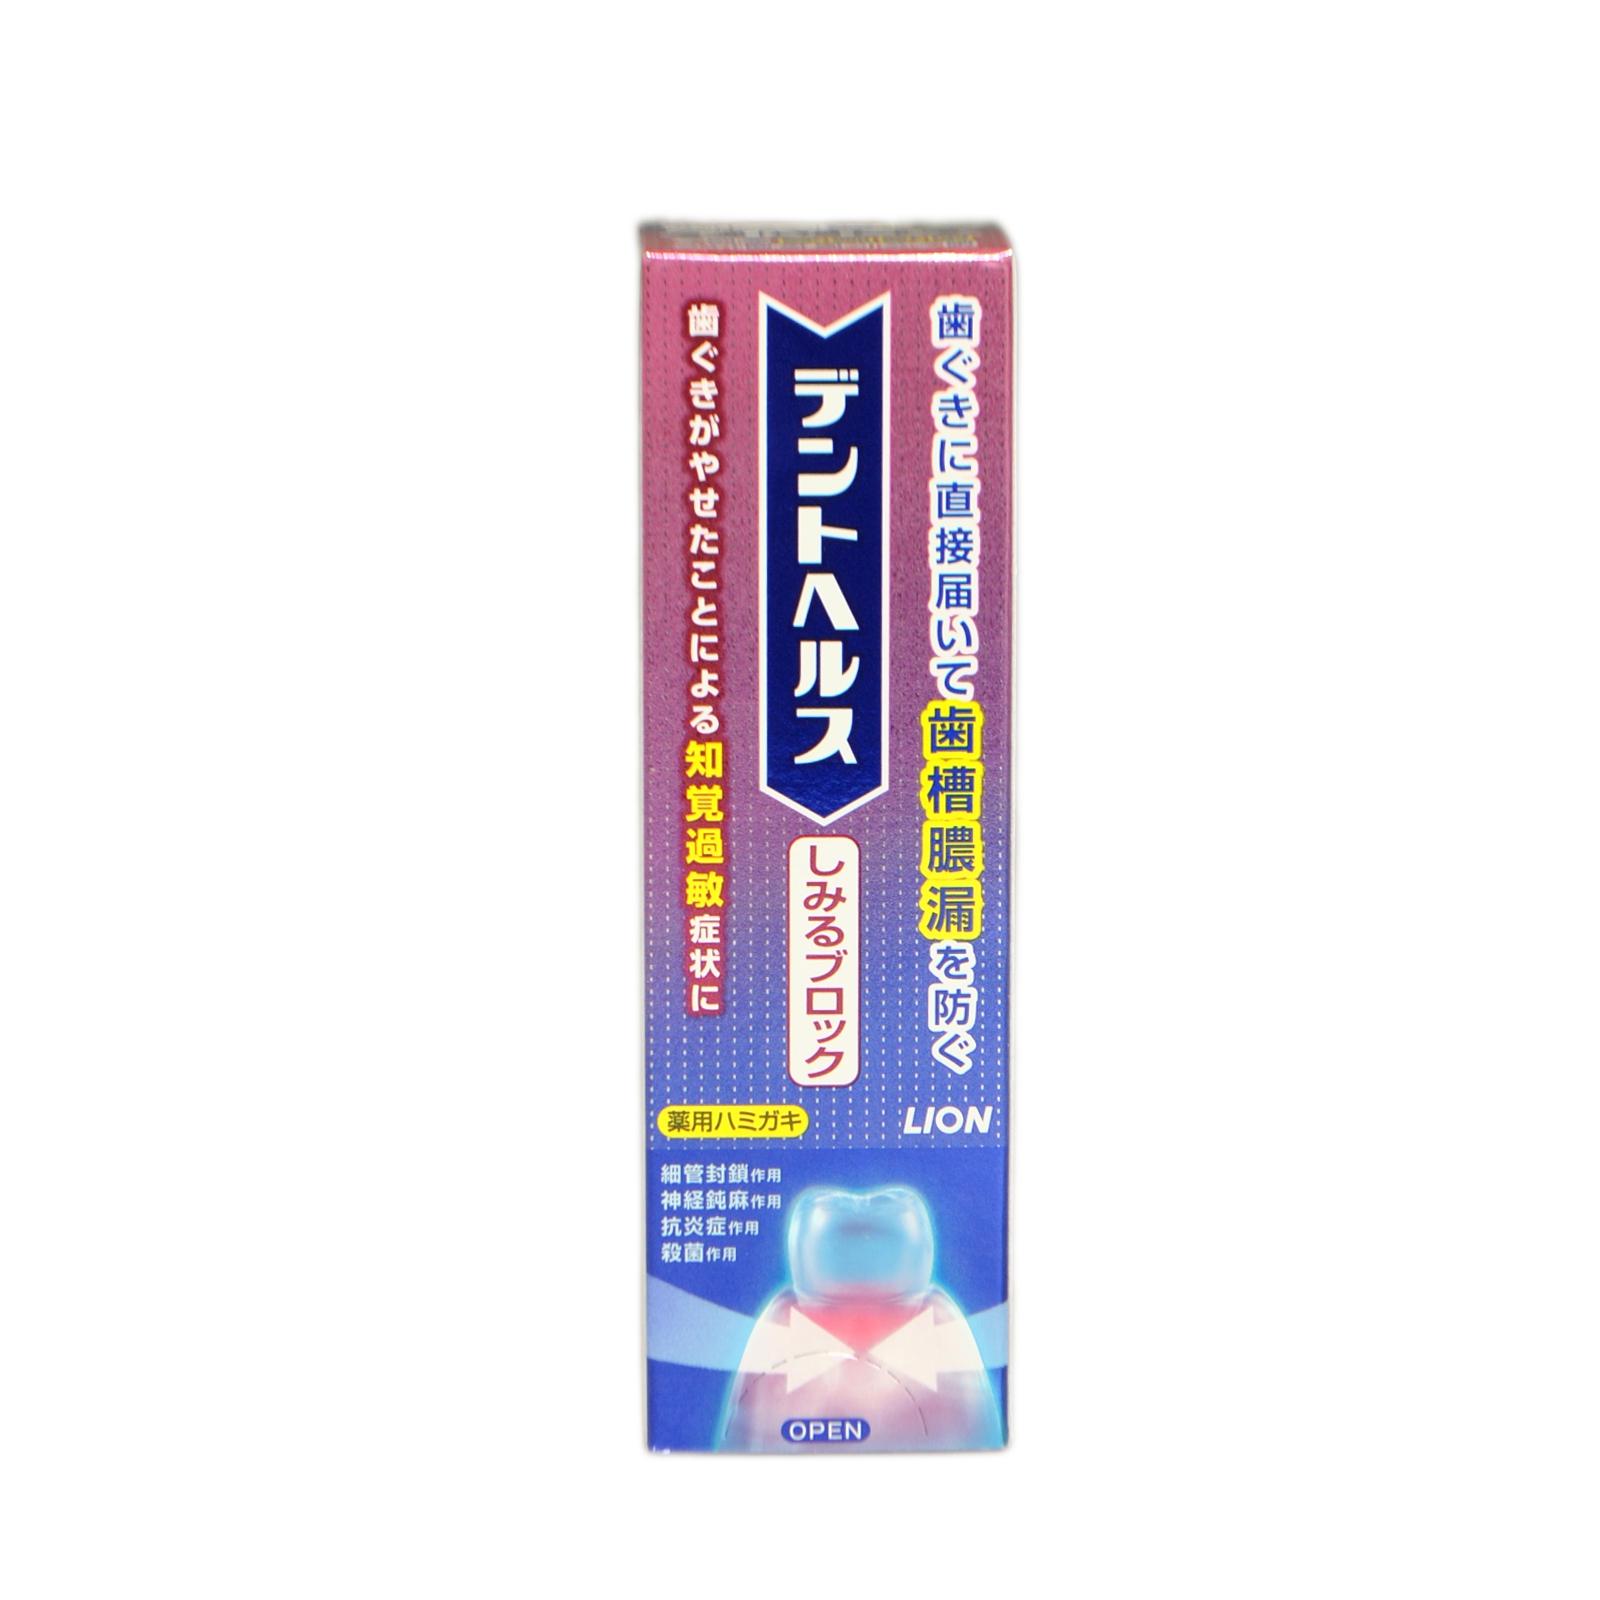 ������ ����� Lion Dental health S ��� ������������ �������� ����� (�� ������ ���� � �������)